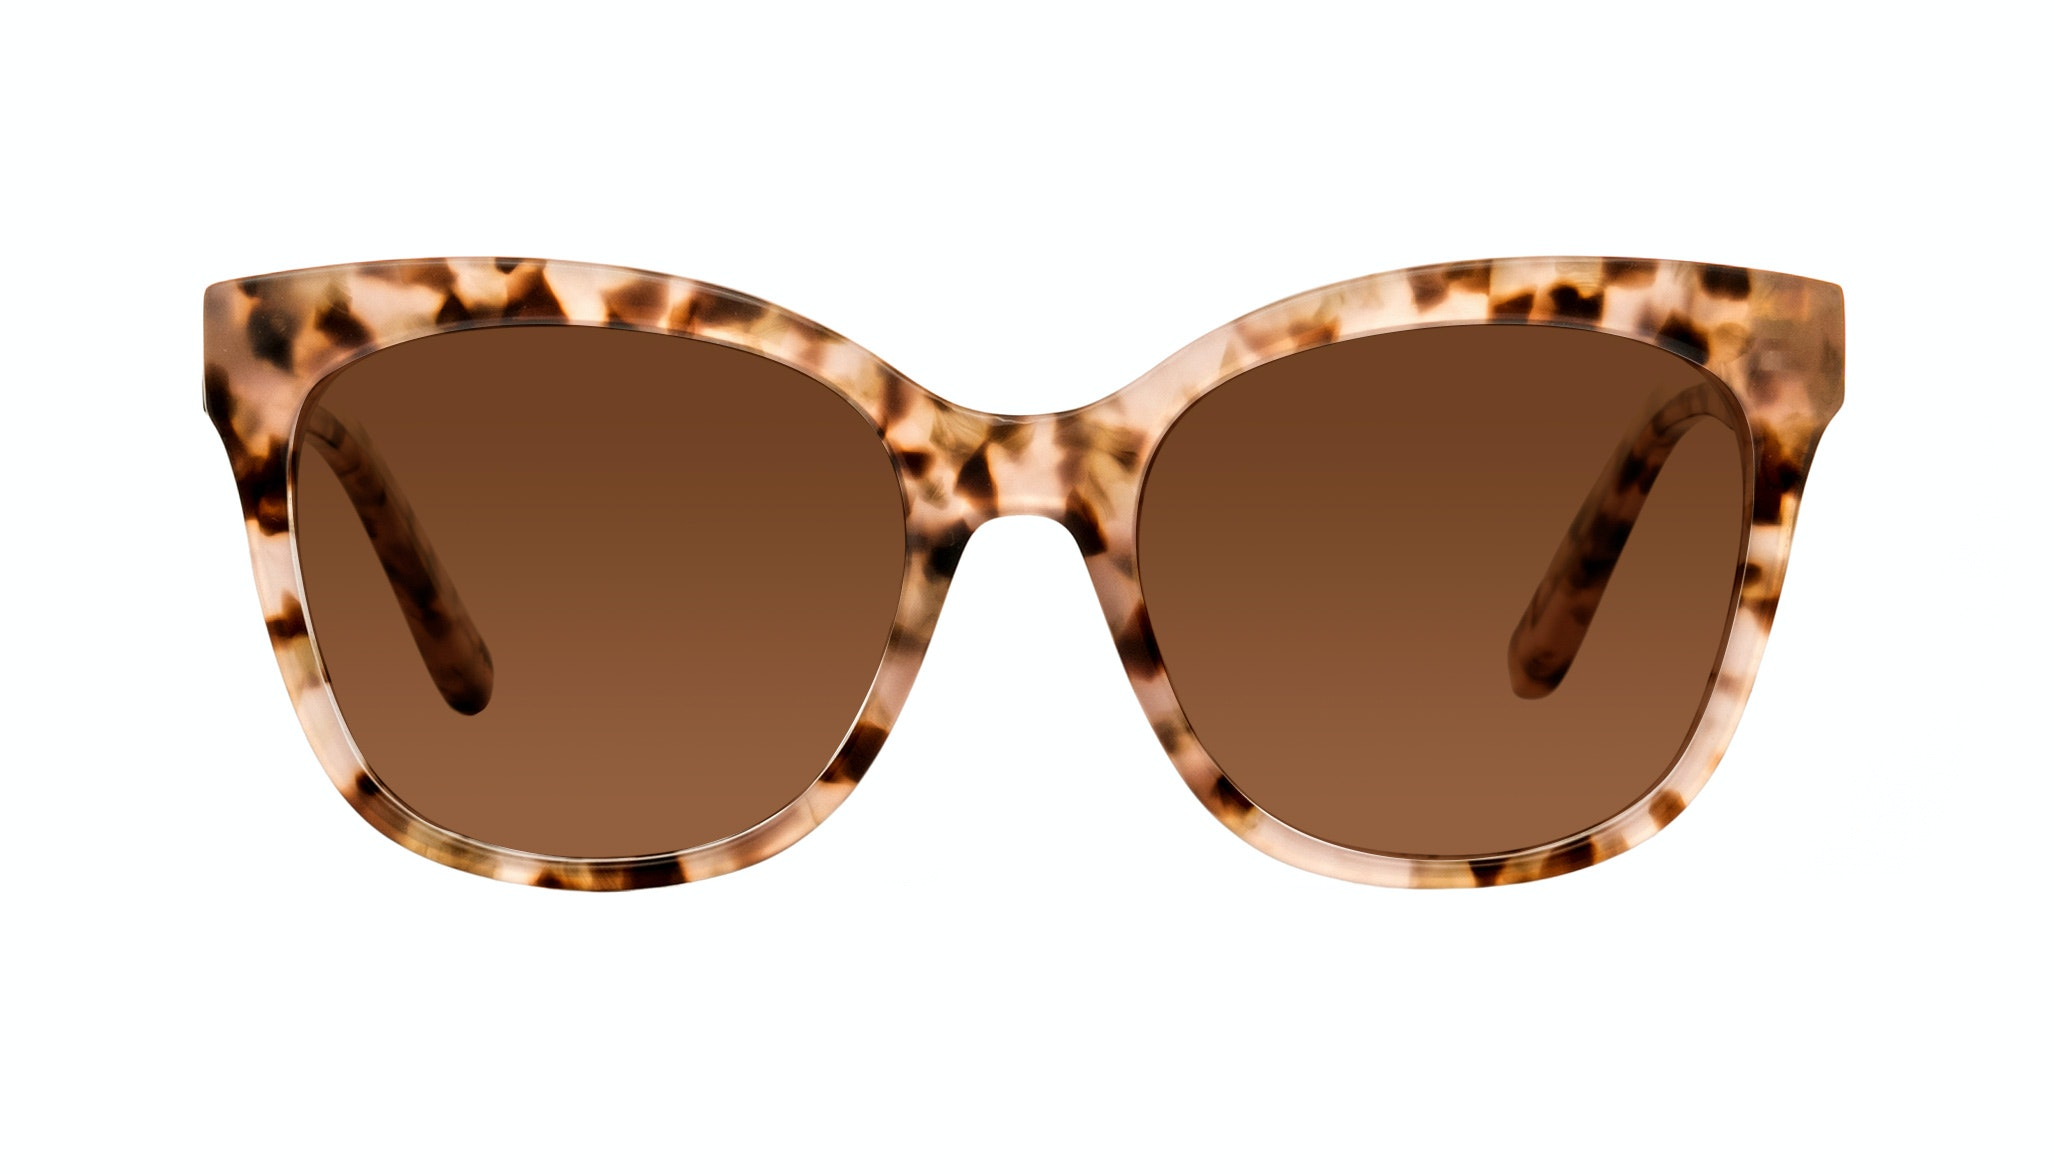 Affordable Fashion Glasses Square Sunglasses Women Breezy Pink Leopard